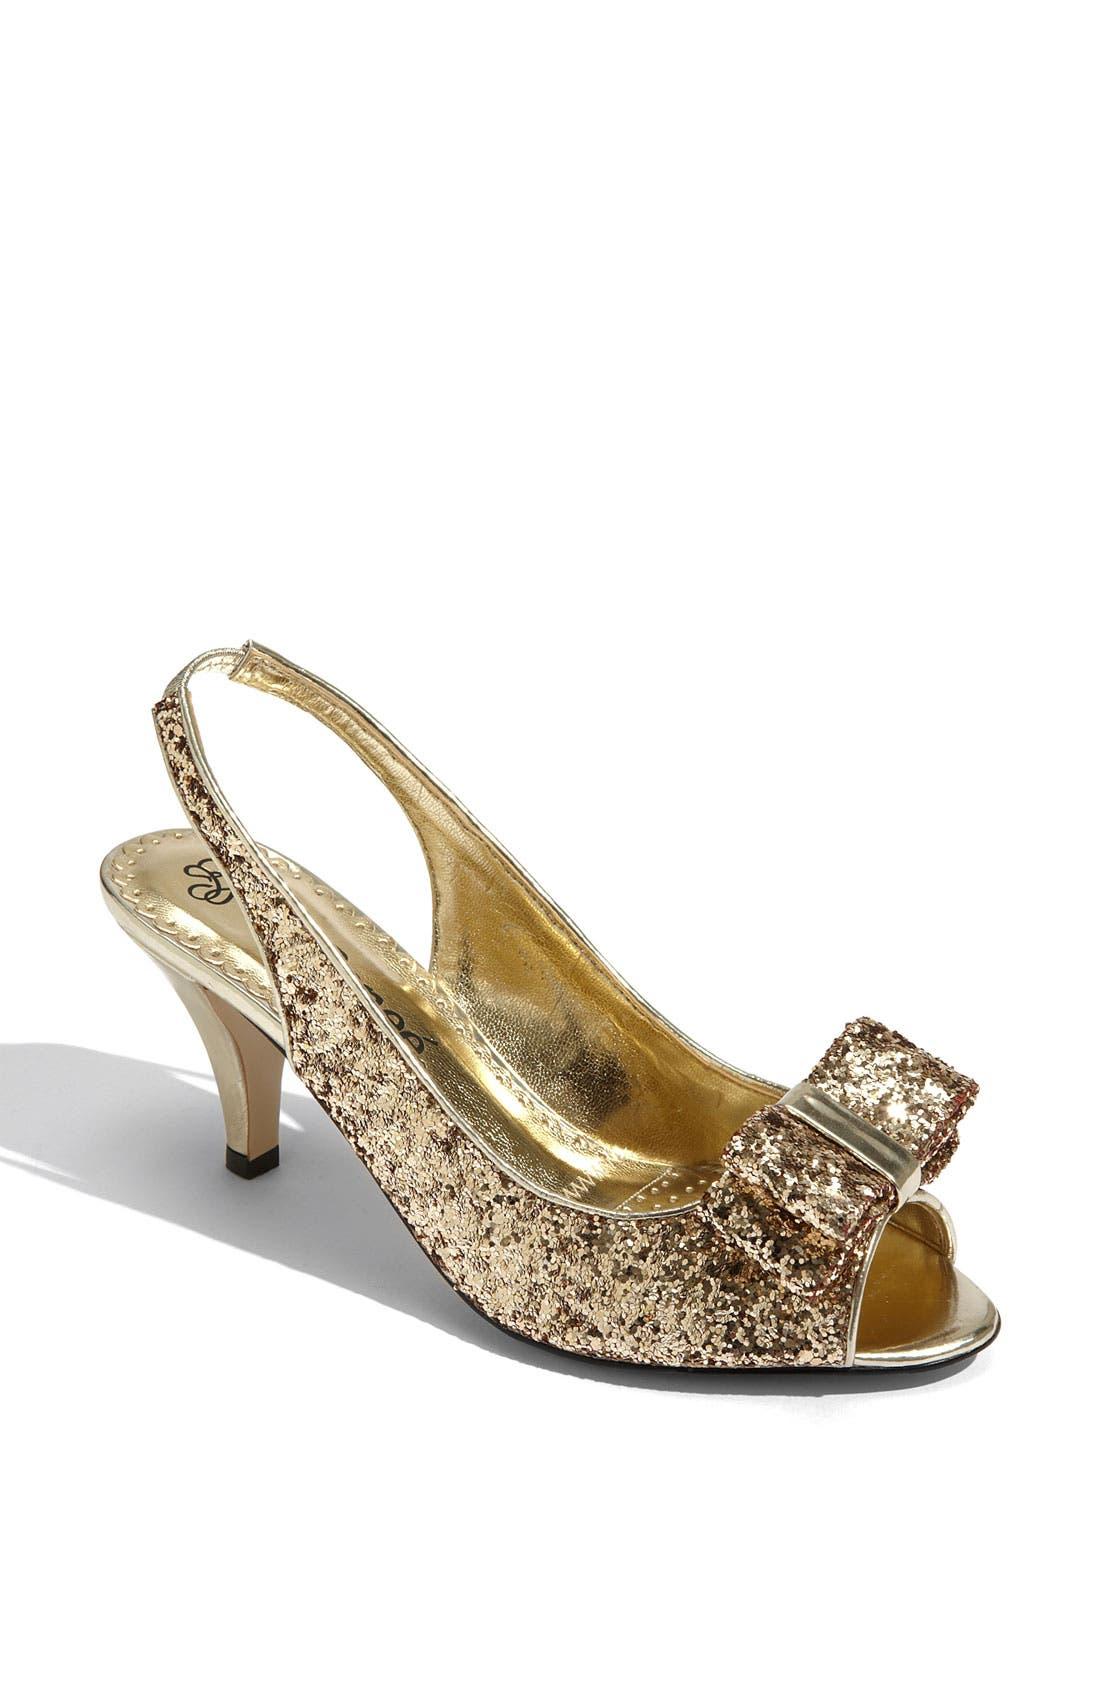 Main Image - J. Reneé 'Rosina' Sandal